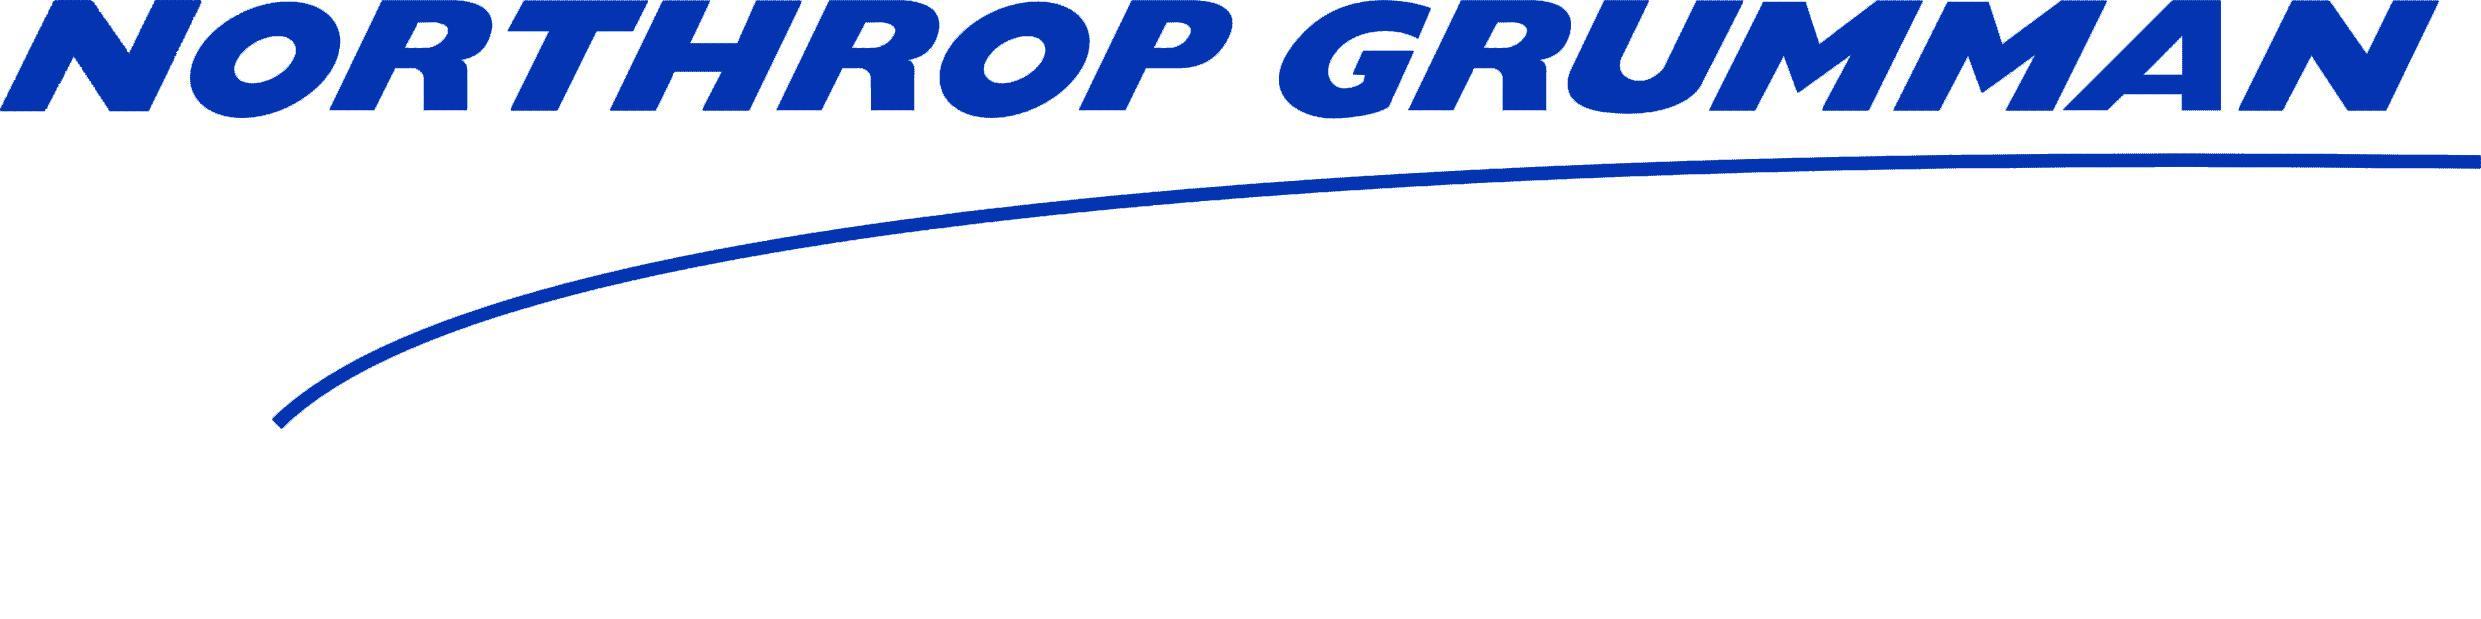 Northrop grumman cover letter address